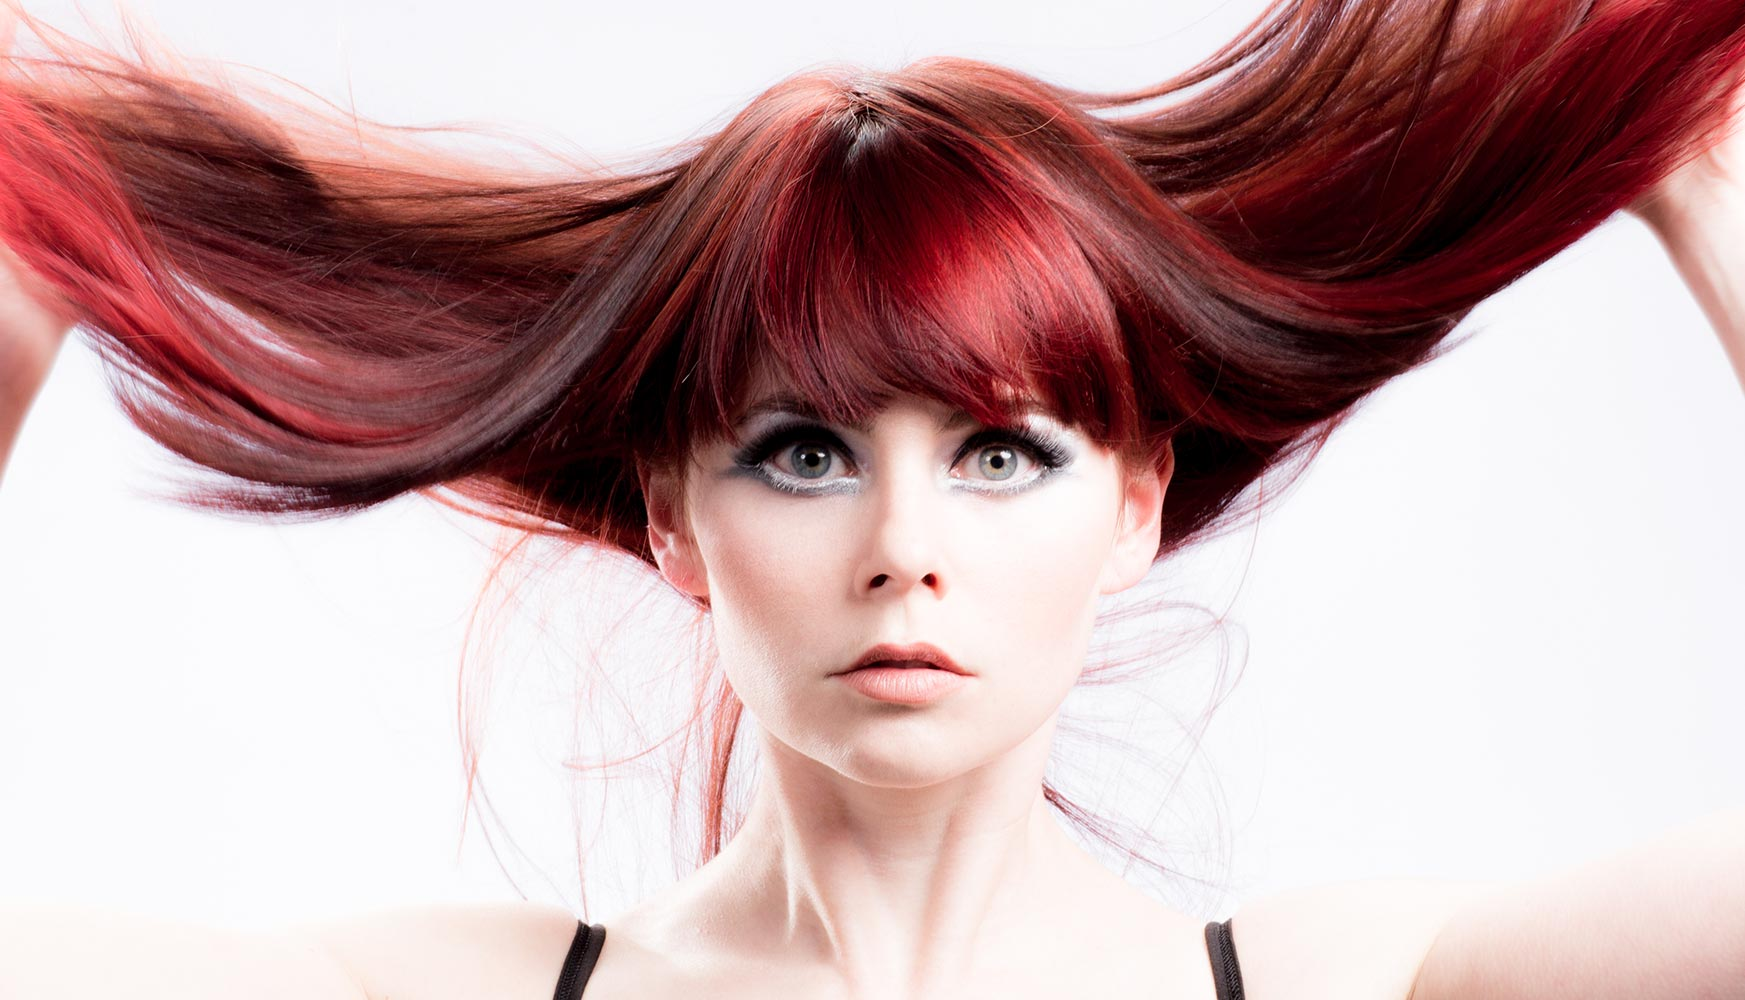 hair-model_RDB.jpg